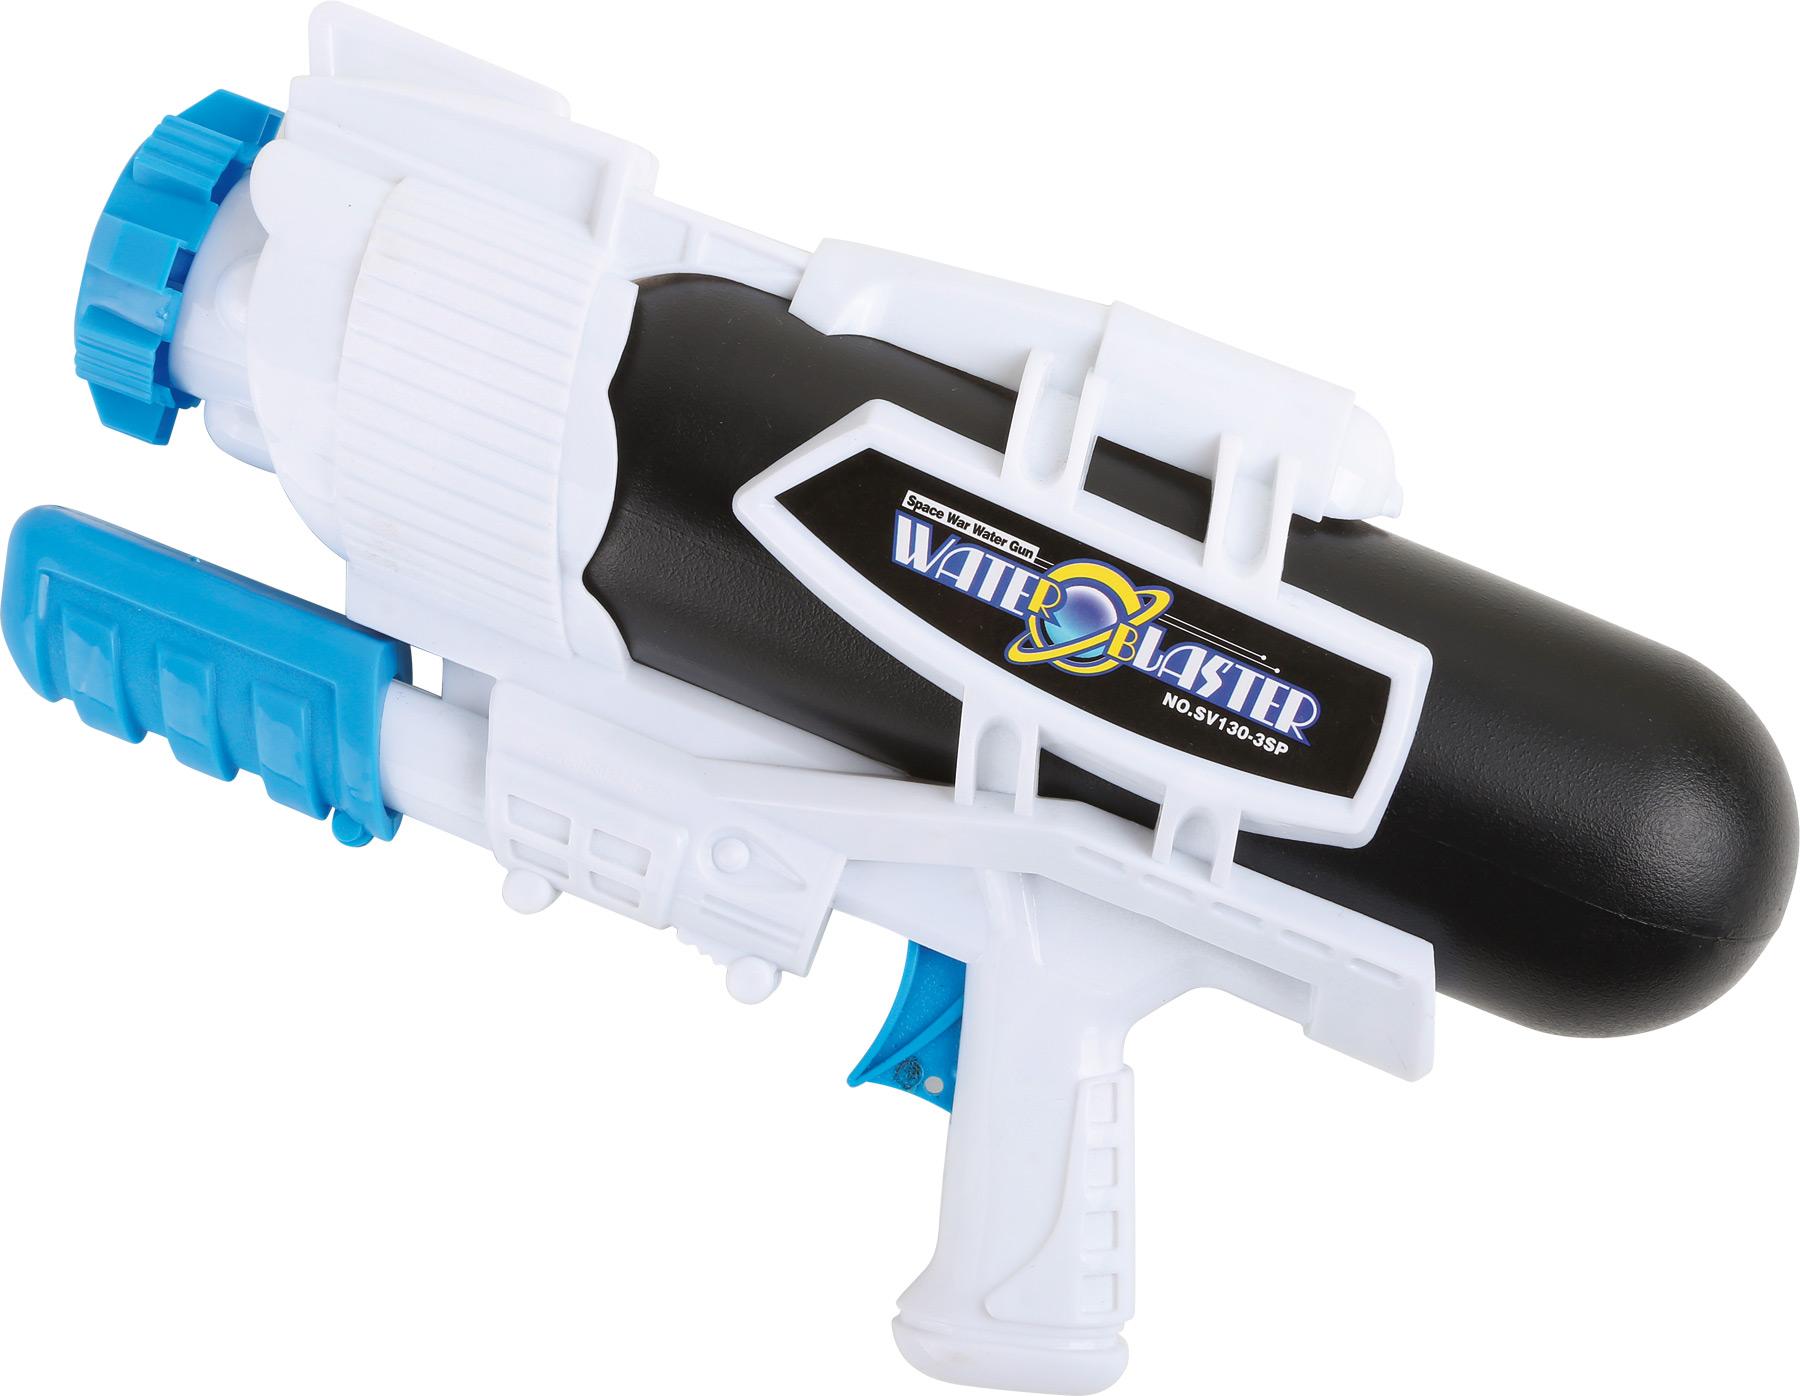 Small Foot Striekacia pištoľ